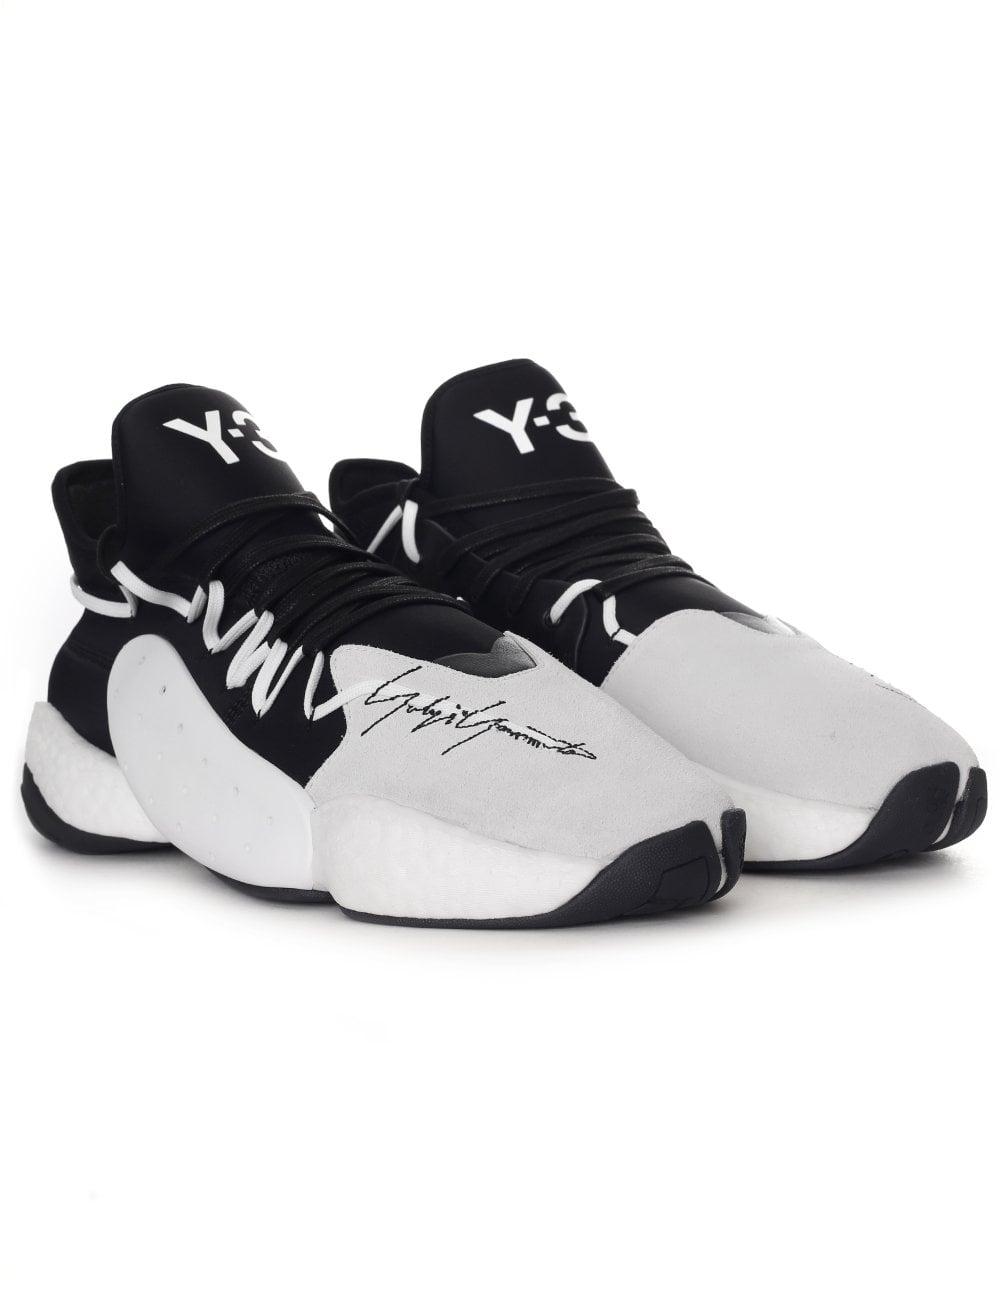 ada10fafa2547 Men s Y3 Adidas BYW BBall Trainers White Black